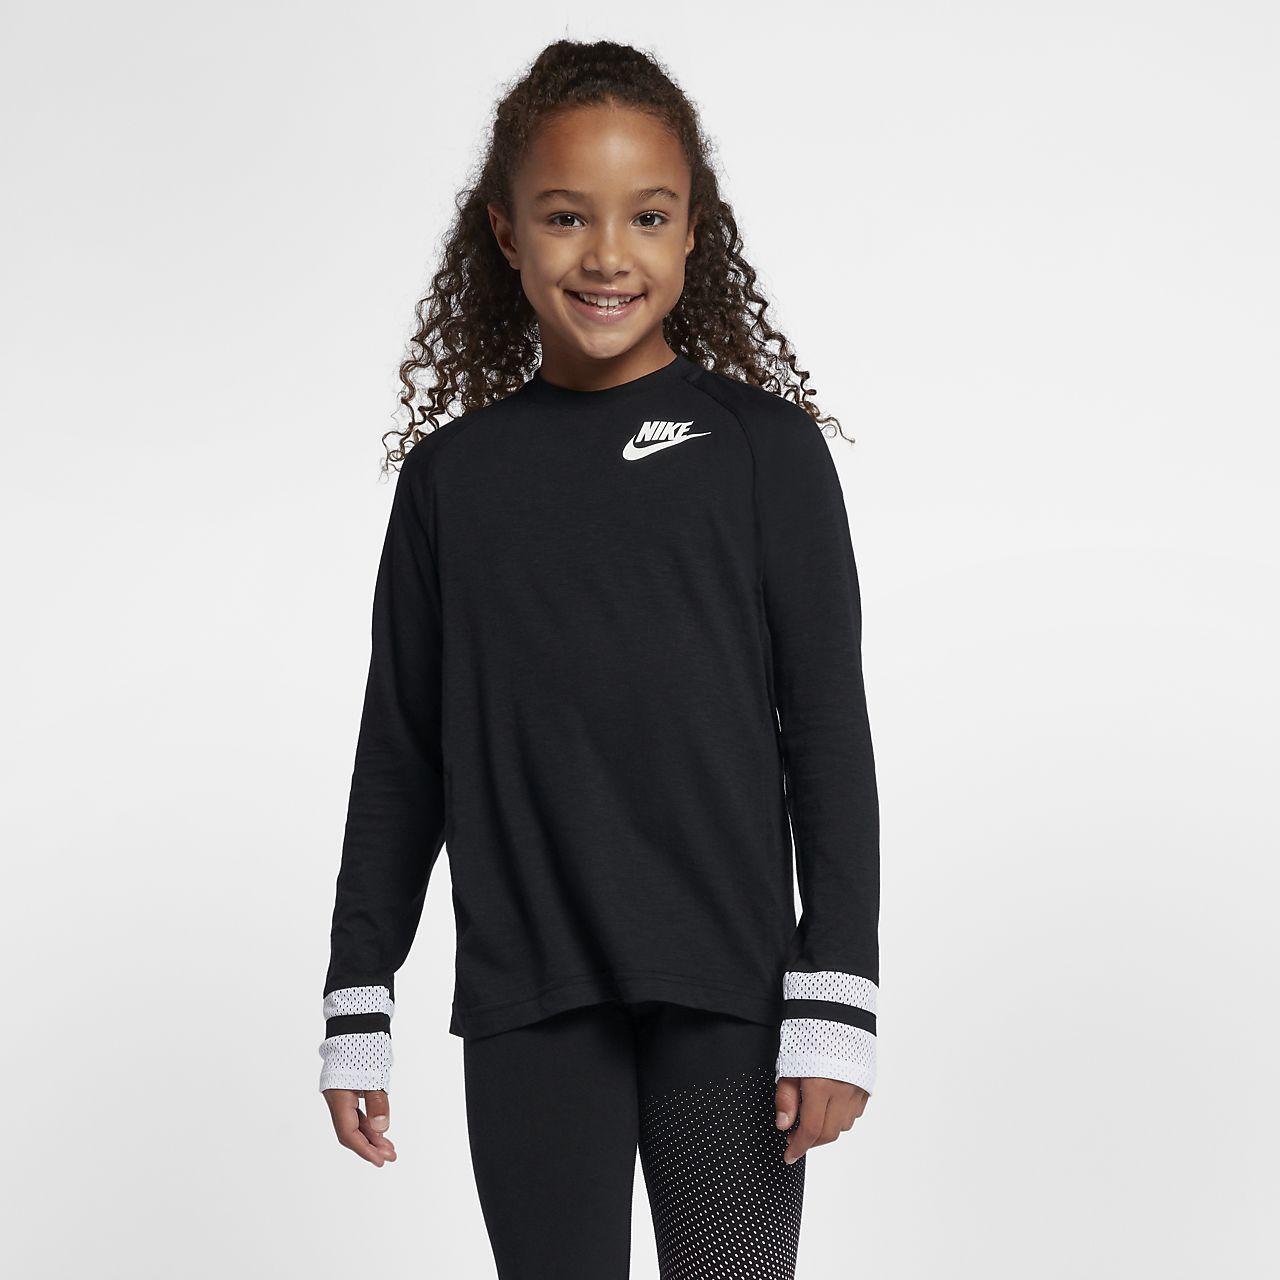 830dc93f Nike Sportswear Older Kids' (Girls') Long-Sleeve Top. Nike.com GB